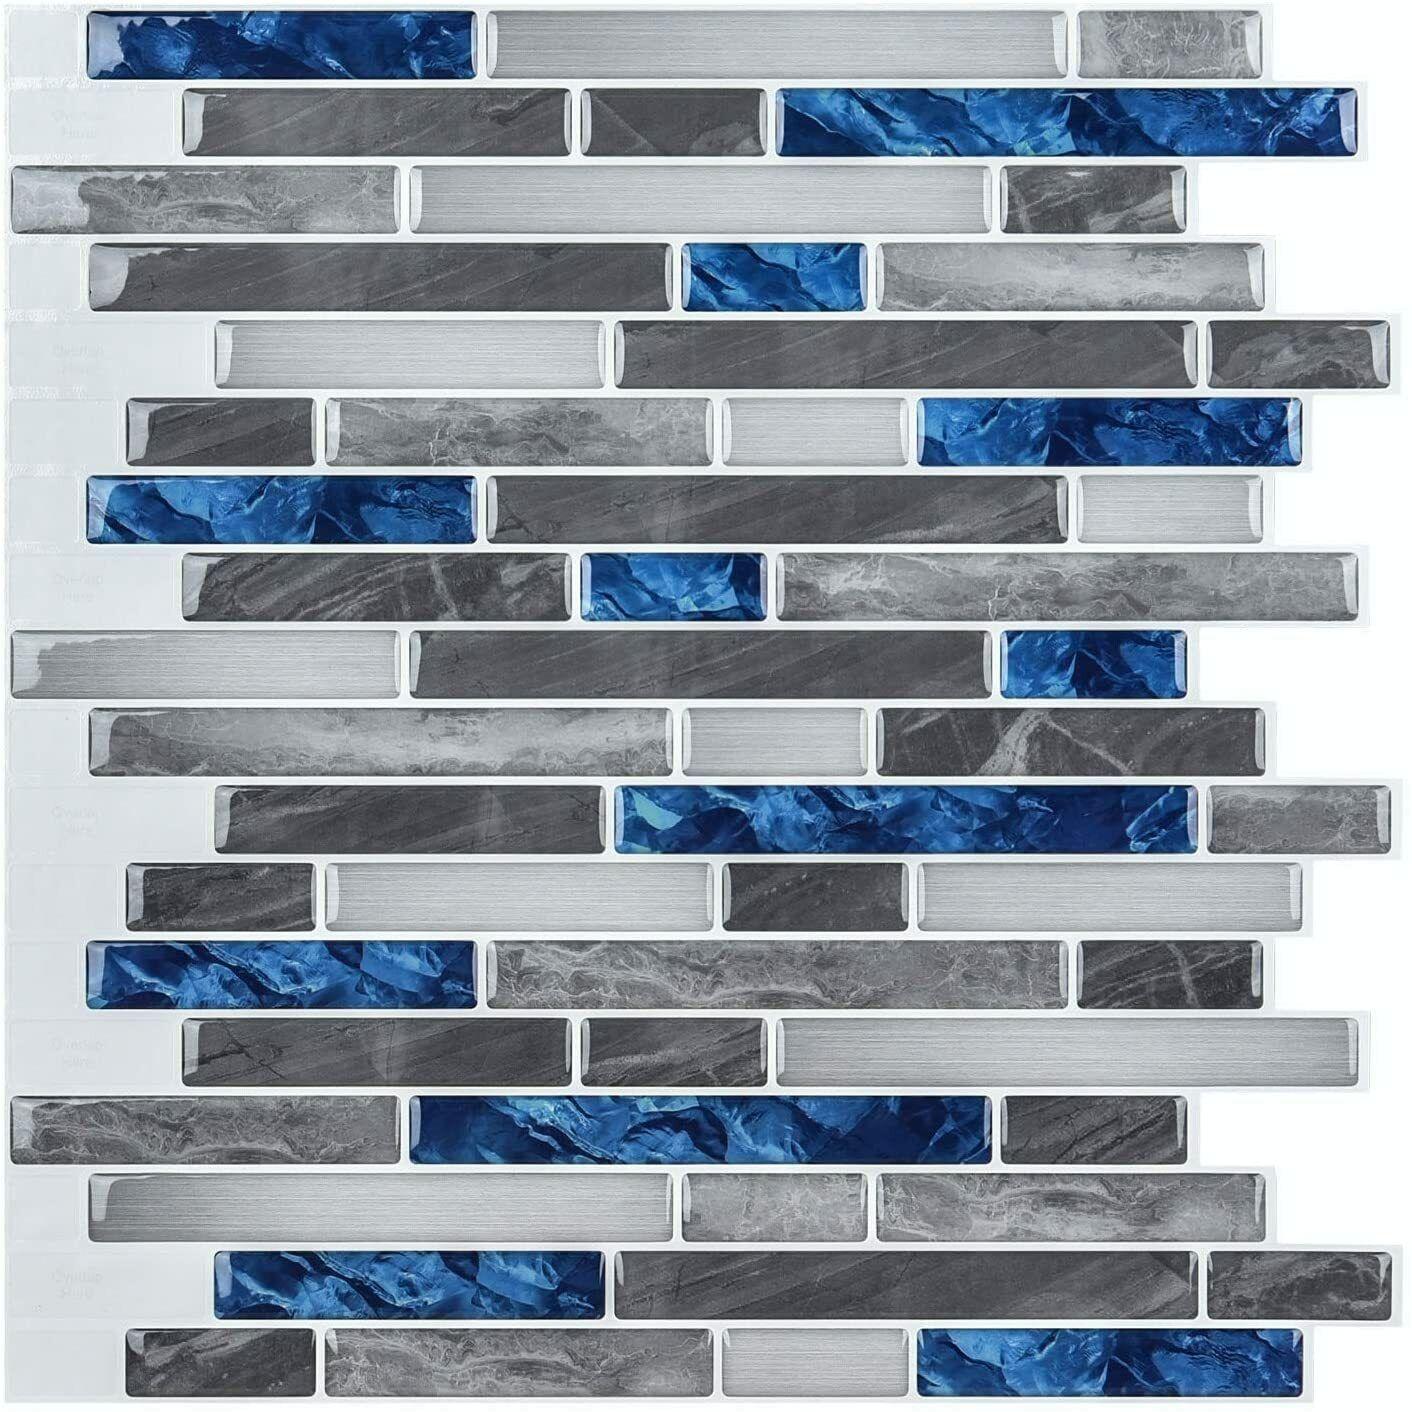 - Self Adhesive Wall Tiles Peel And Stick Backsplash Kitchen